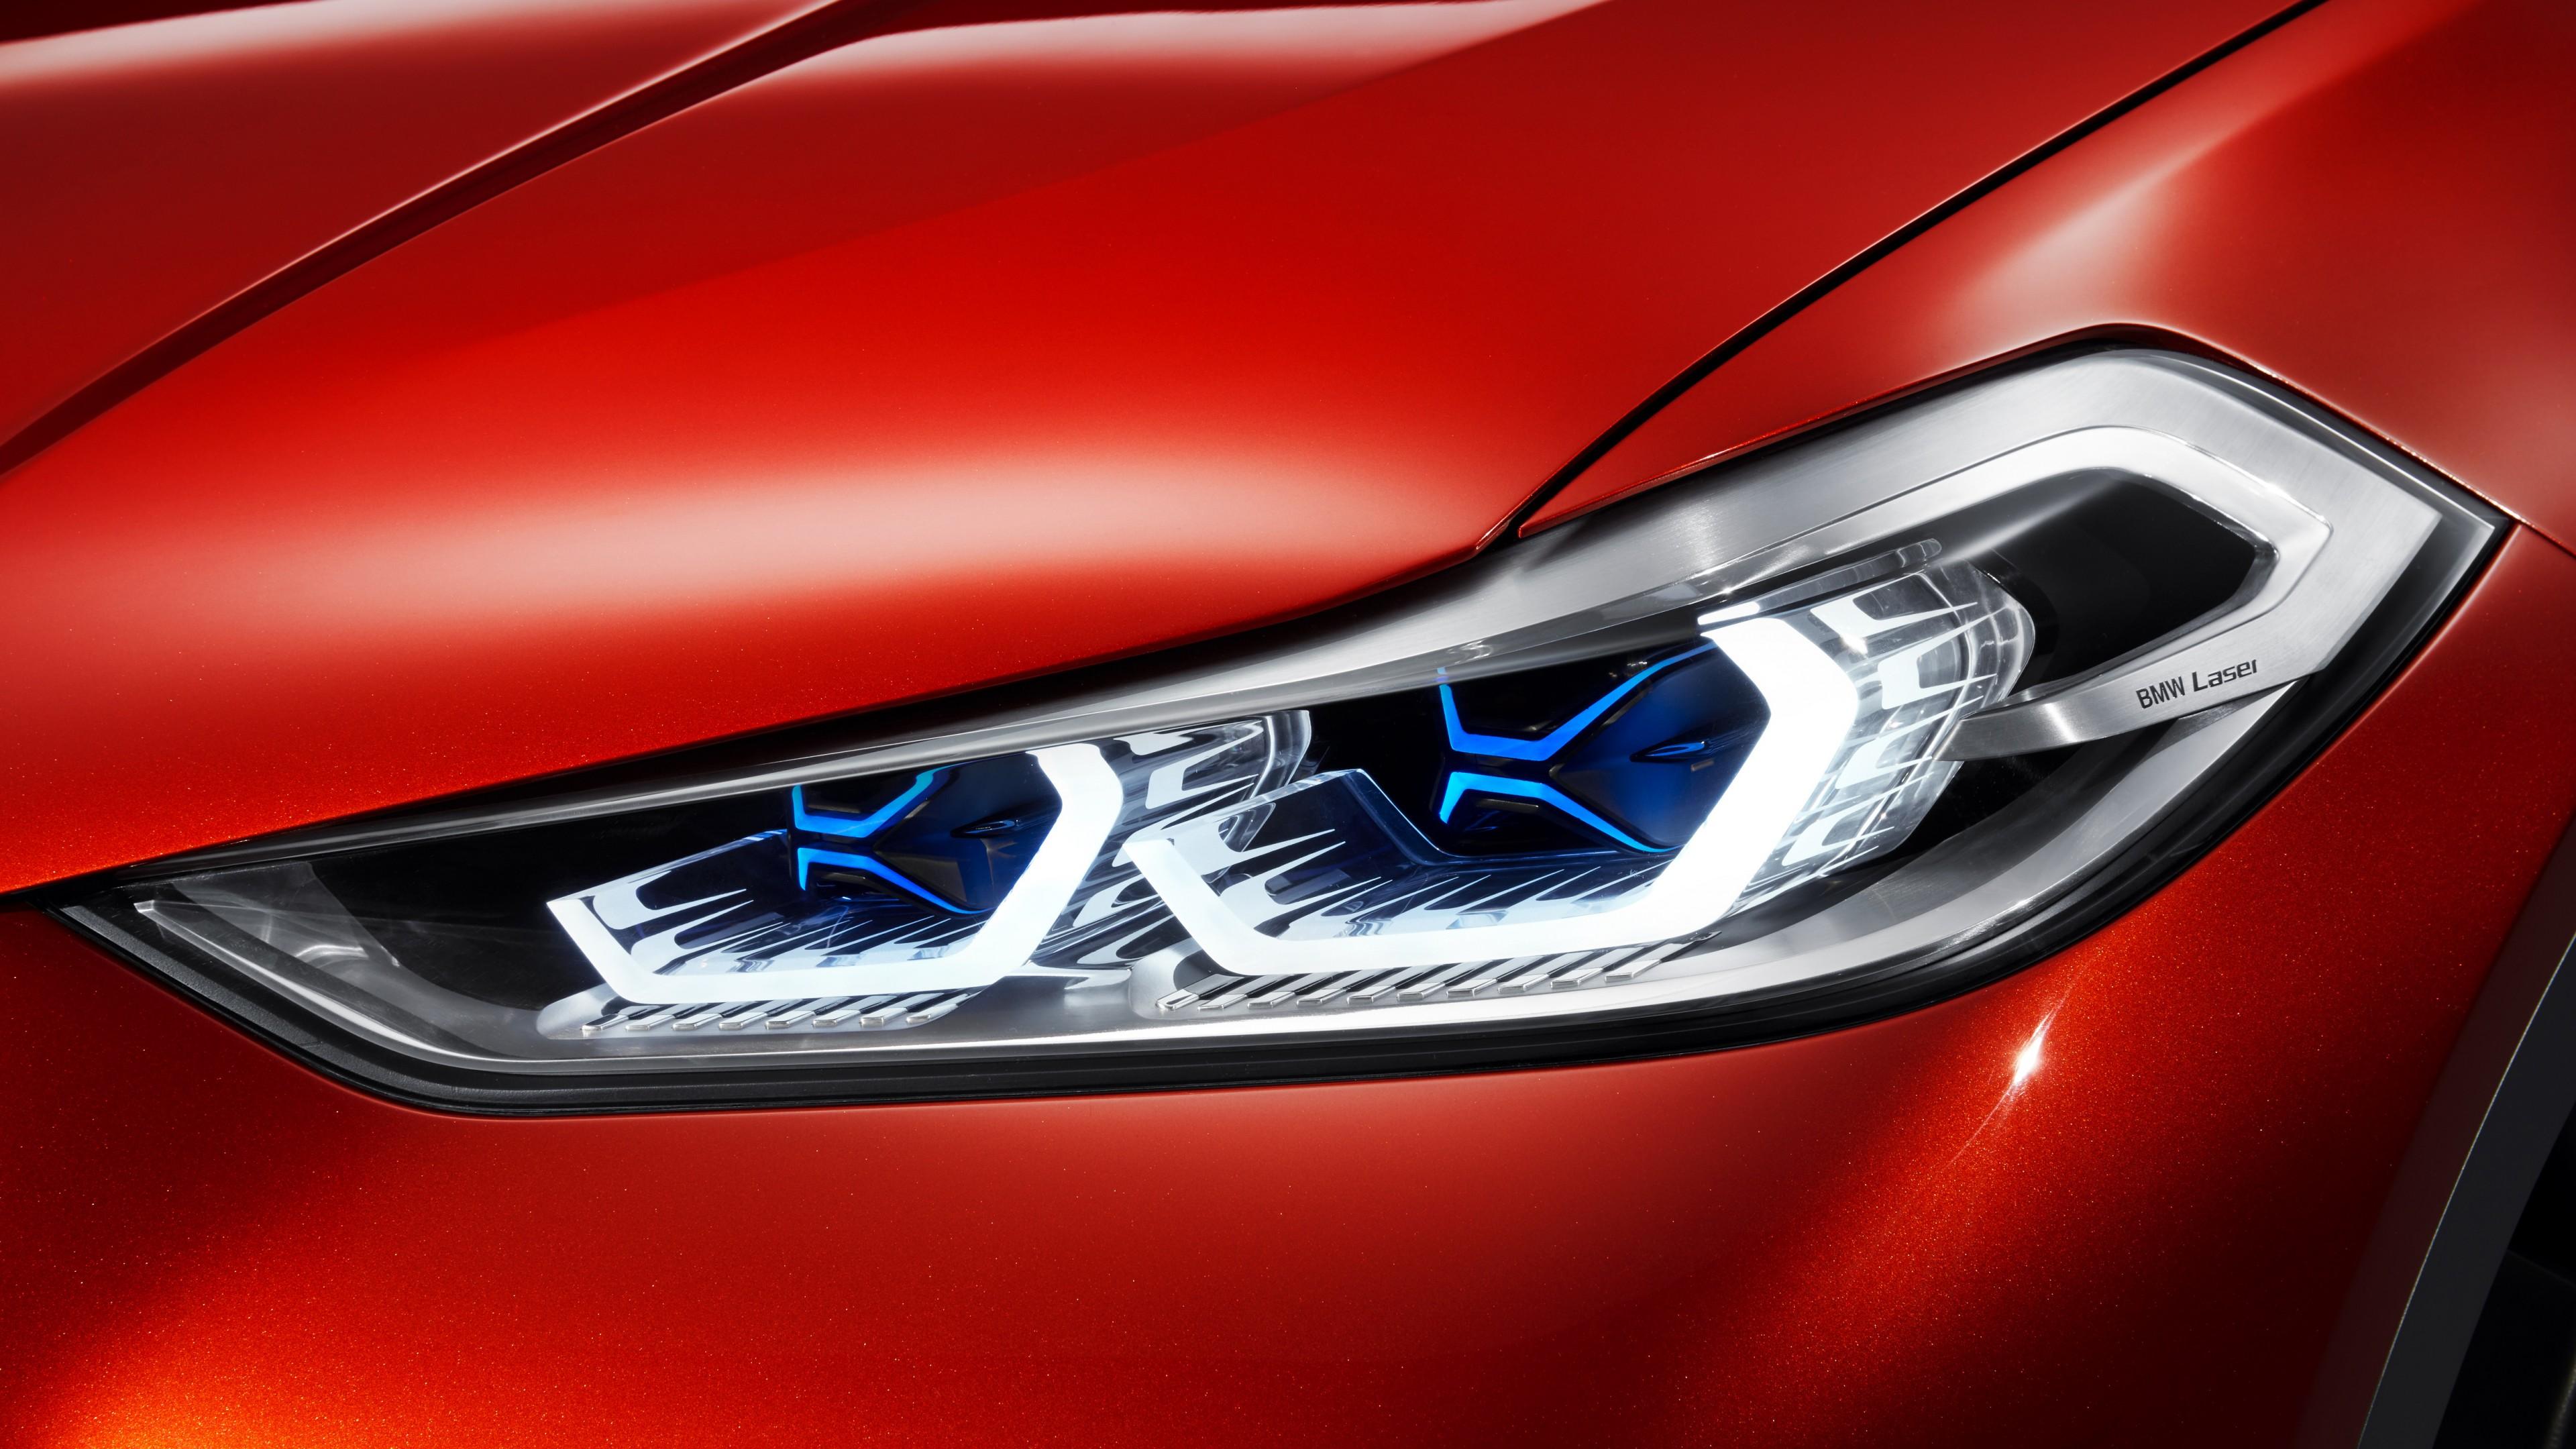 2018 Bmw X2 Laser Headlights Wallpaper Hd Car Wallpapers